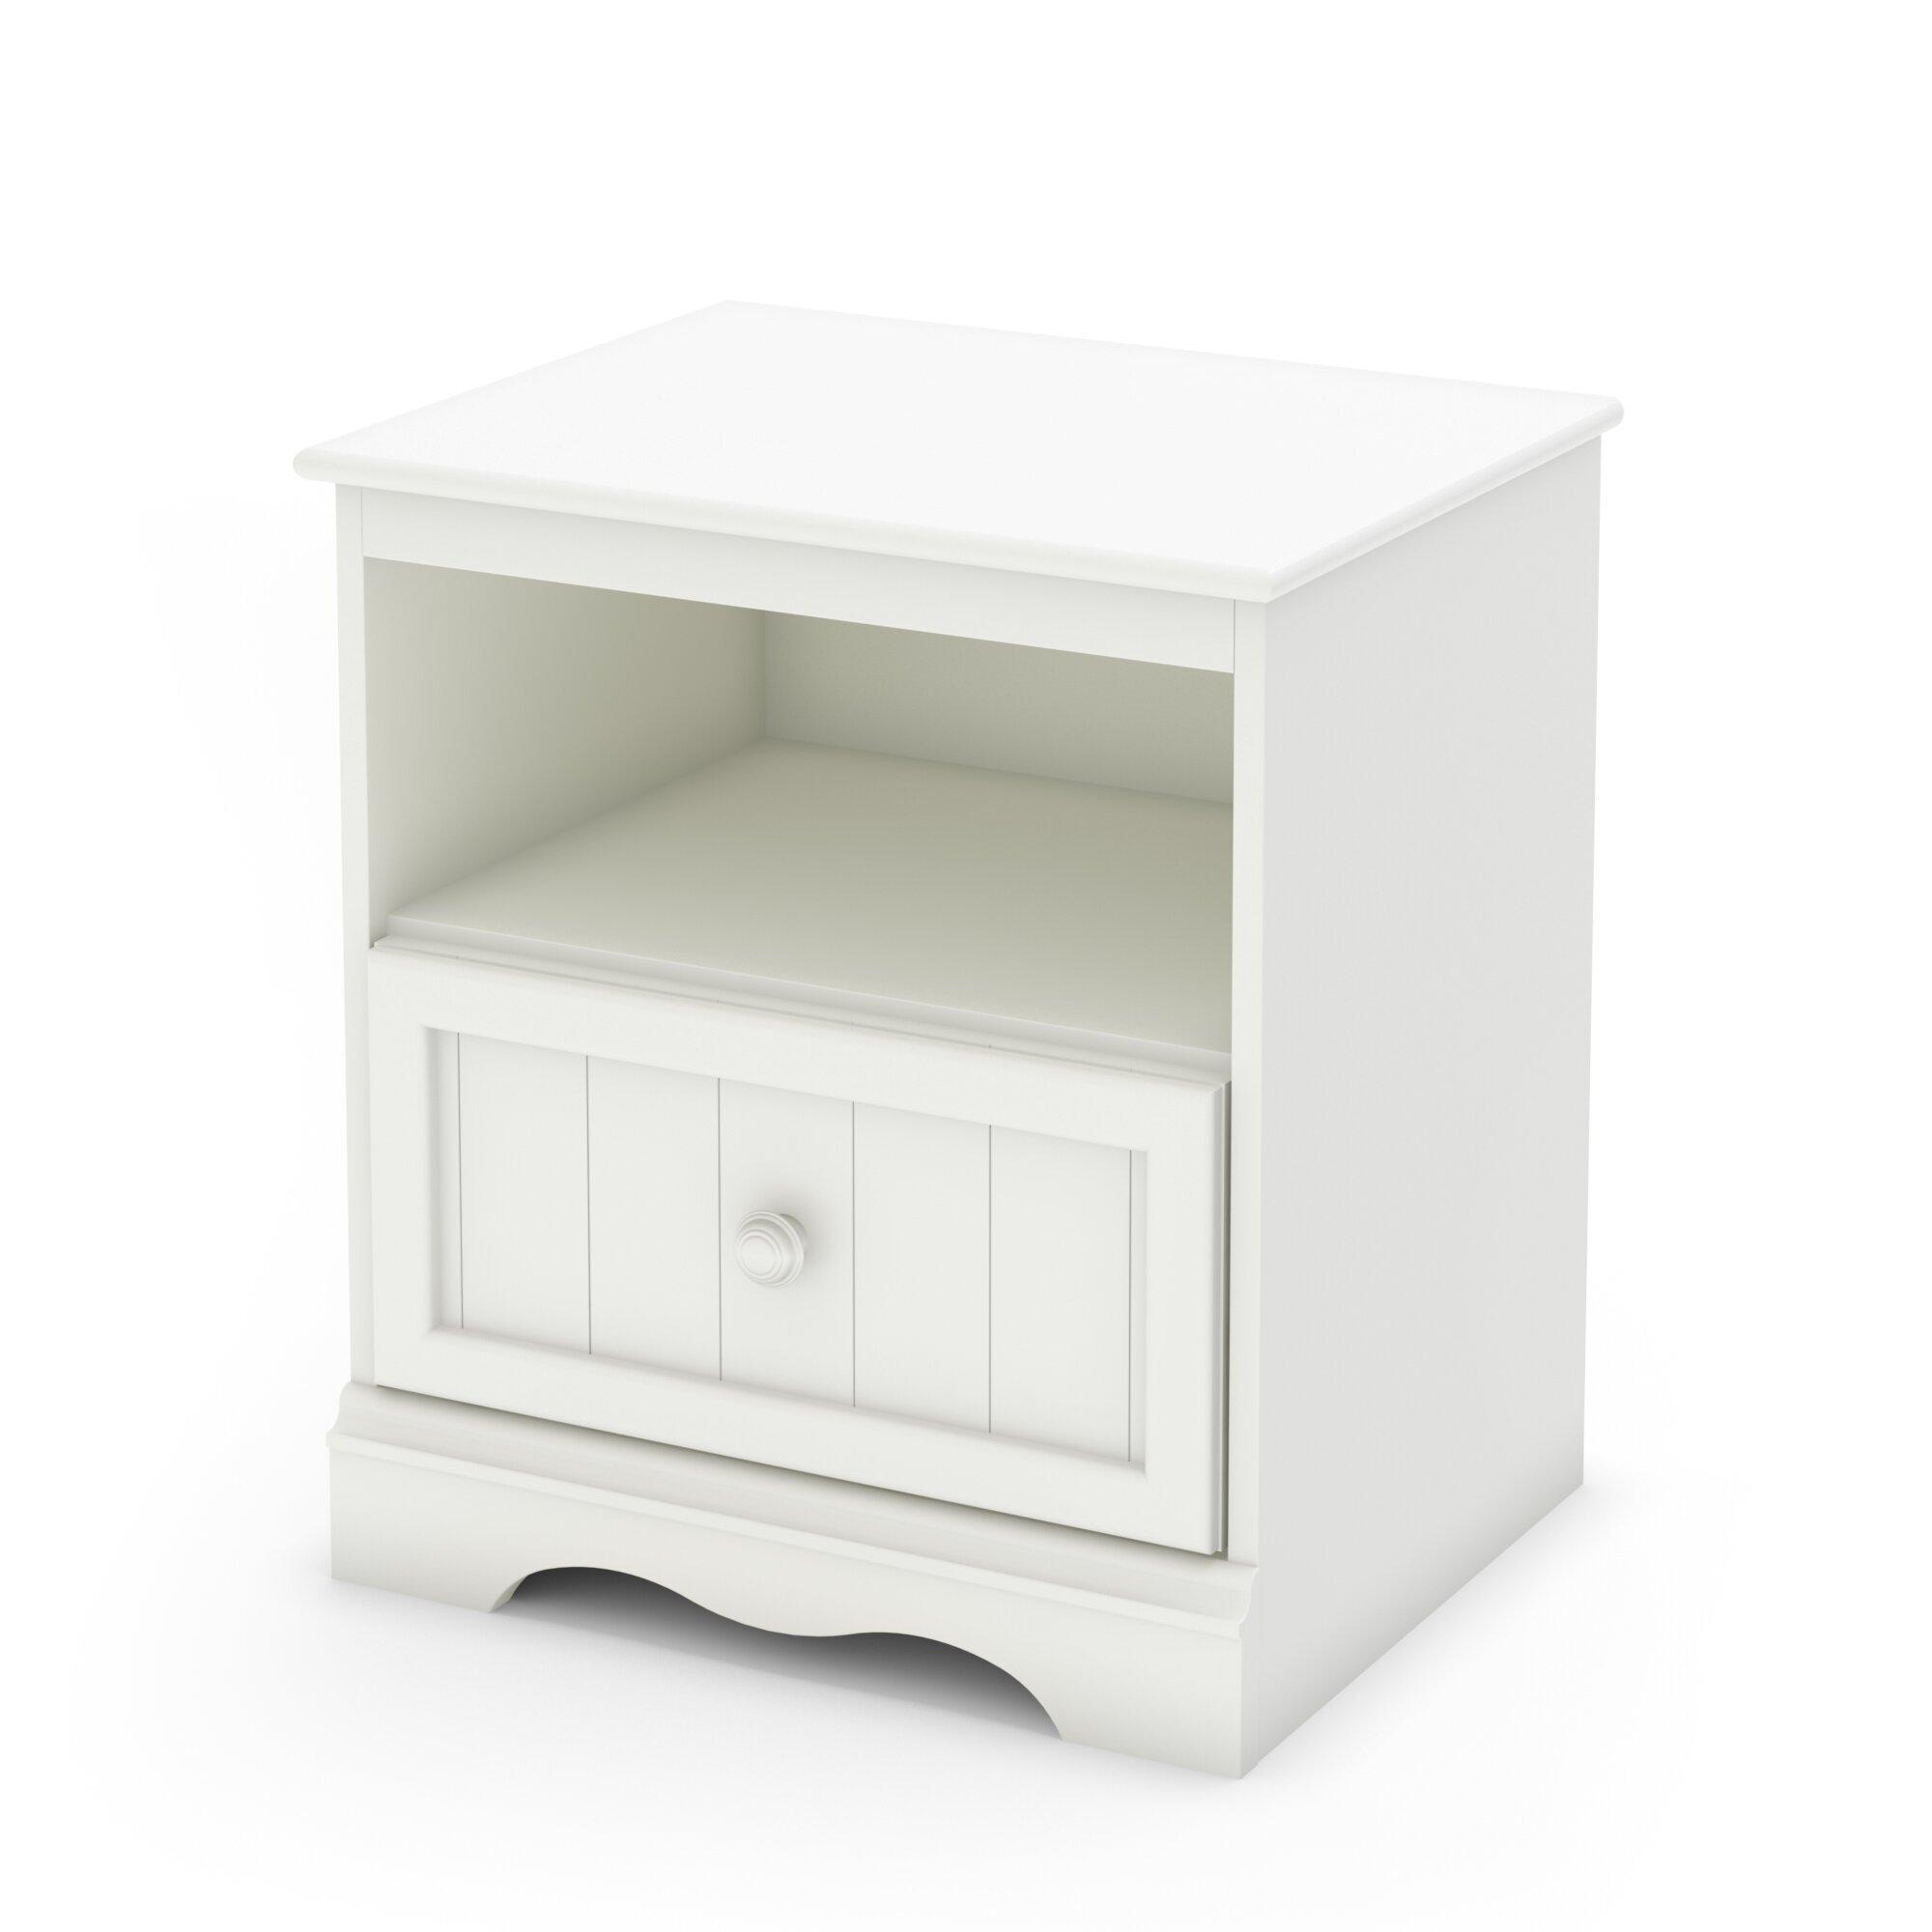 Prestington savannah 1 drawer bedside table reviews for 1 drawer bedside table